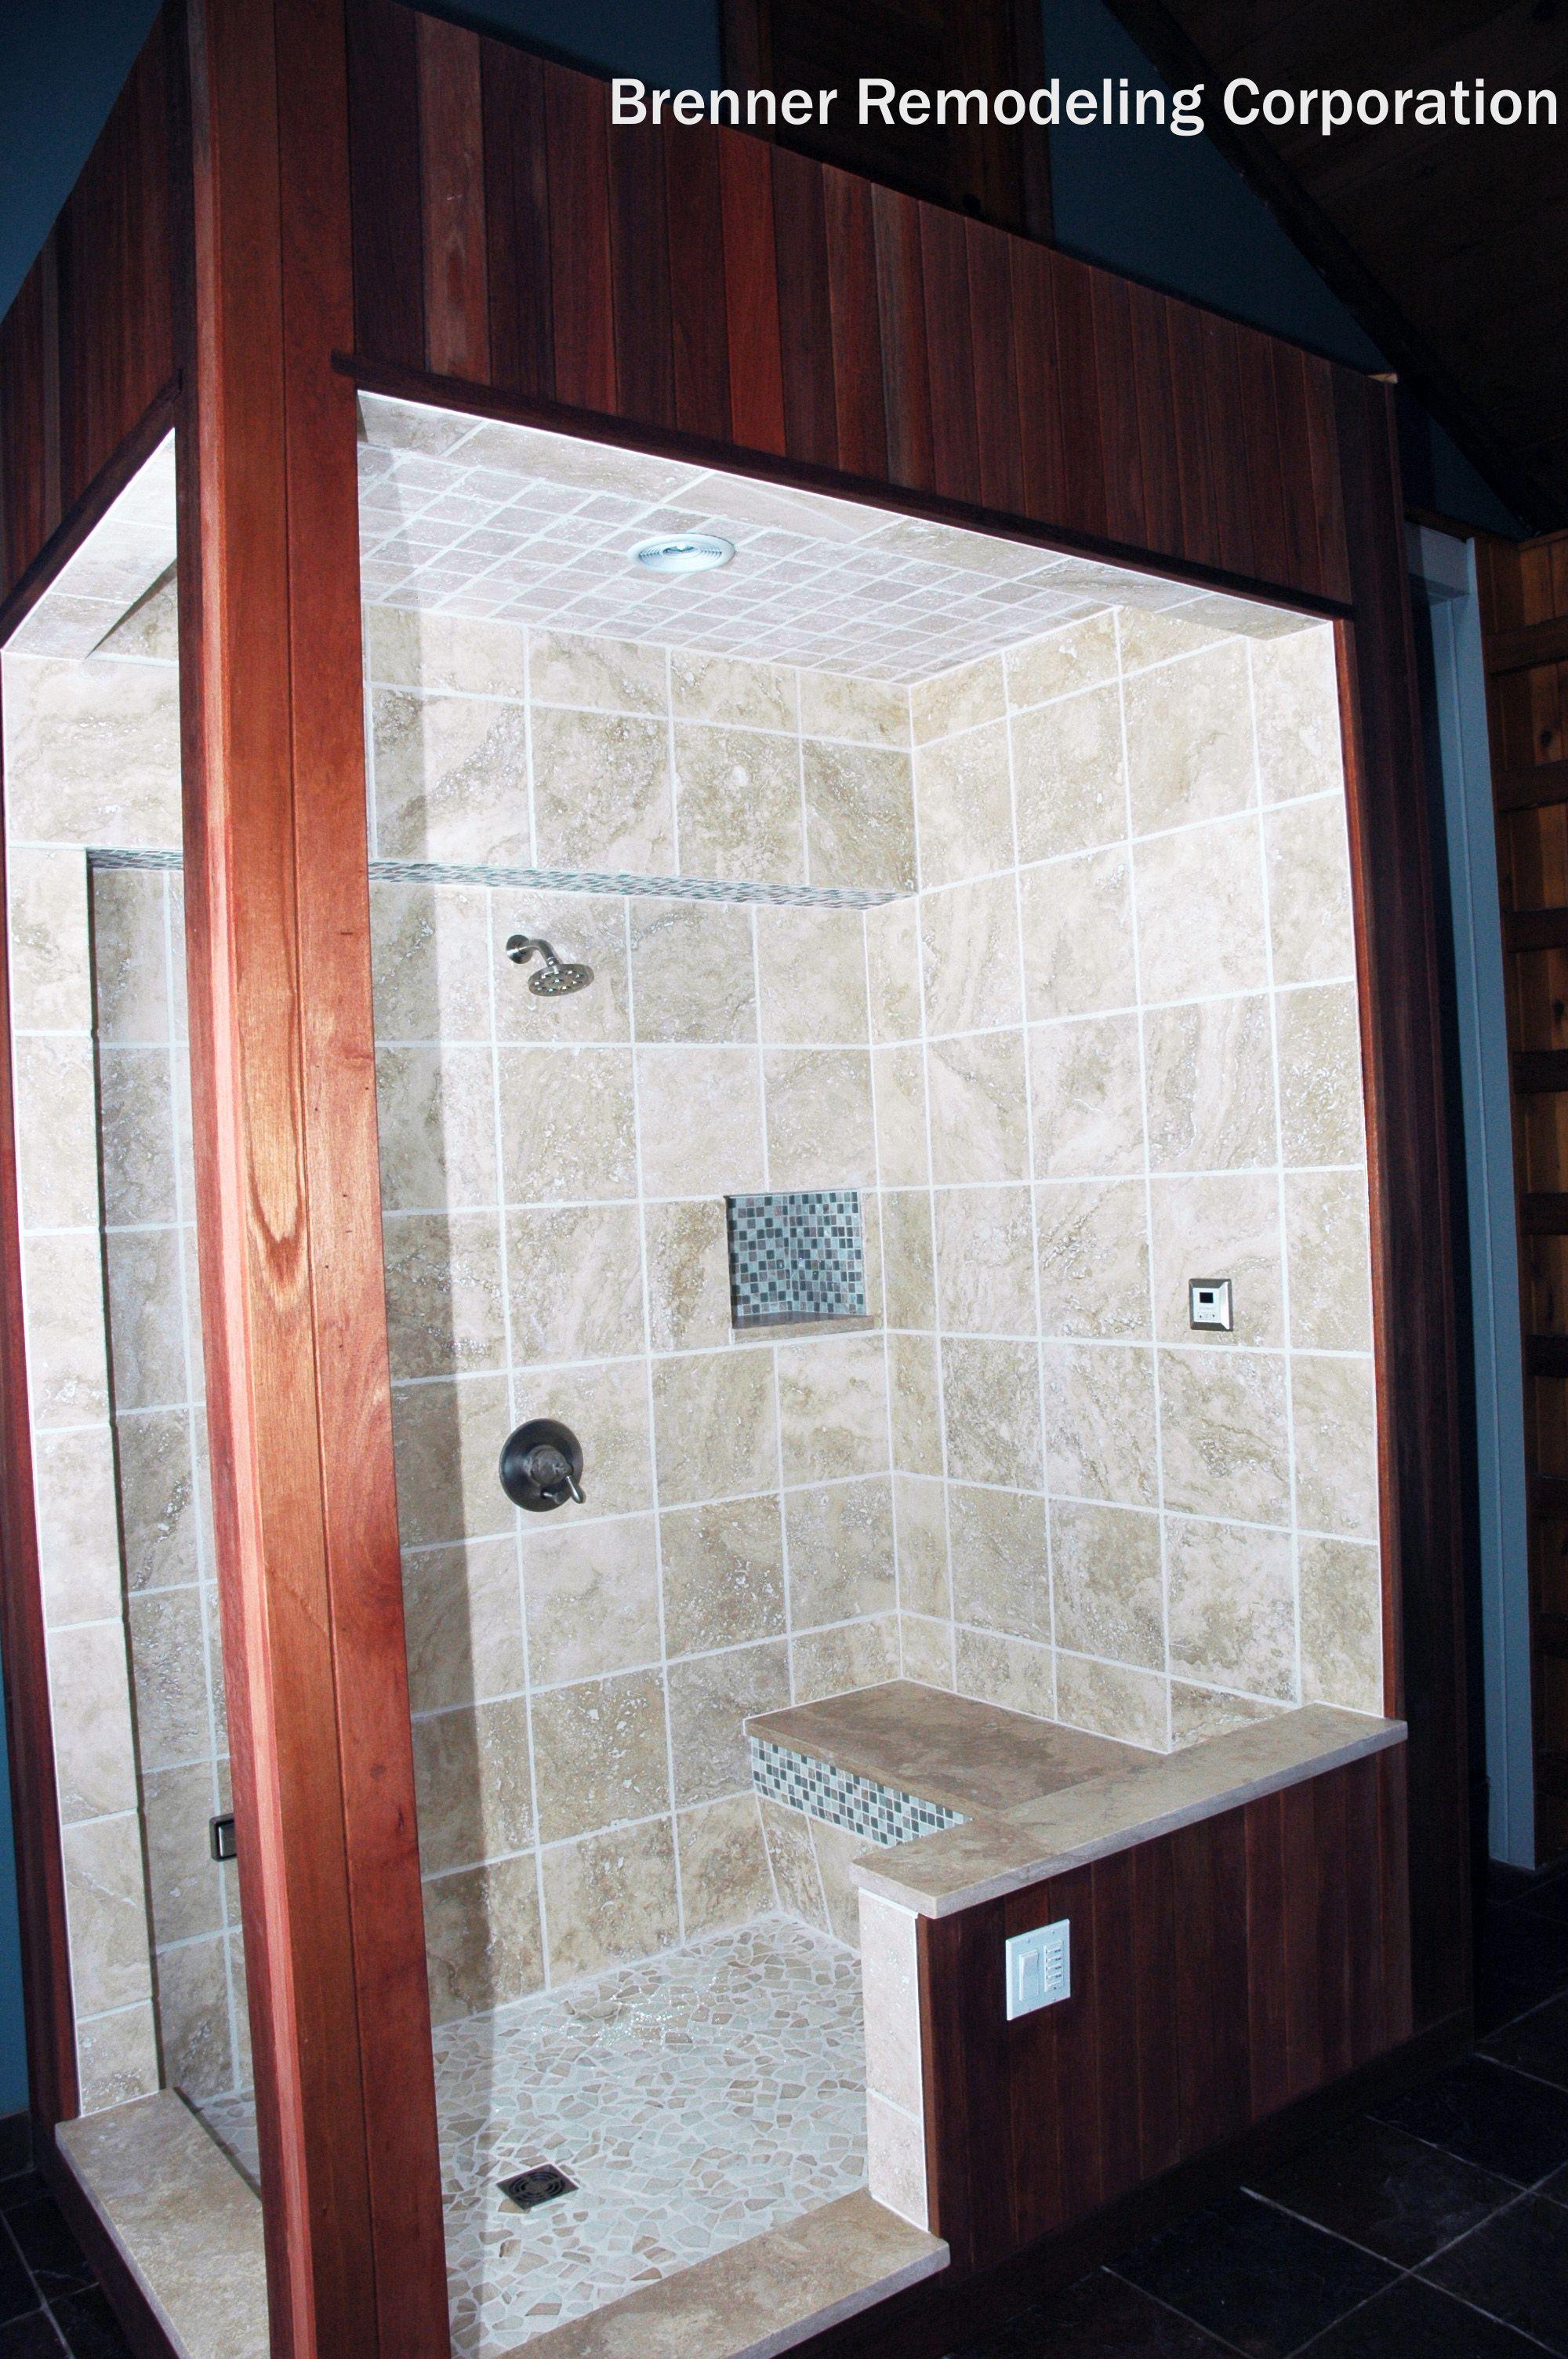 2020 Bathroom Remodel Cost Average Cost Of Bathroom Remodel Renovations Bathroom Remodel Cost Bathroom Renovation Cost Bathrooms Remodel